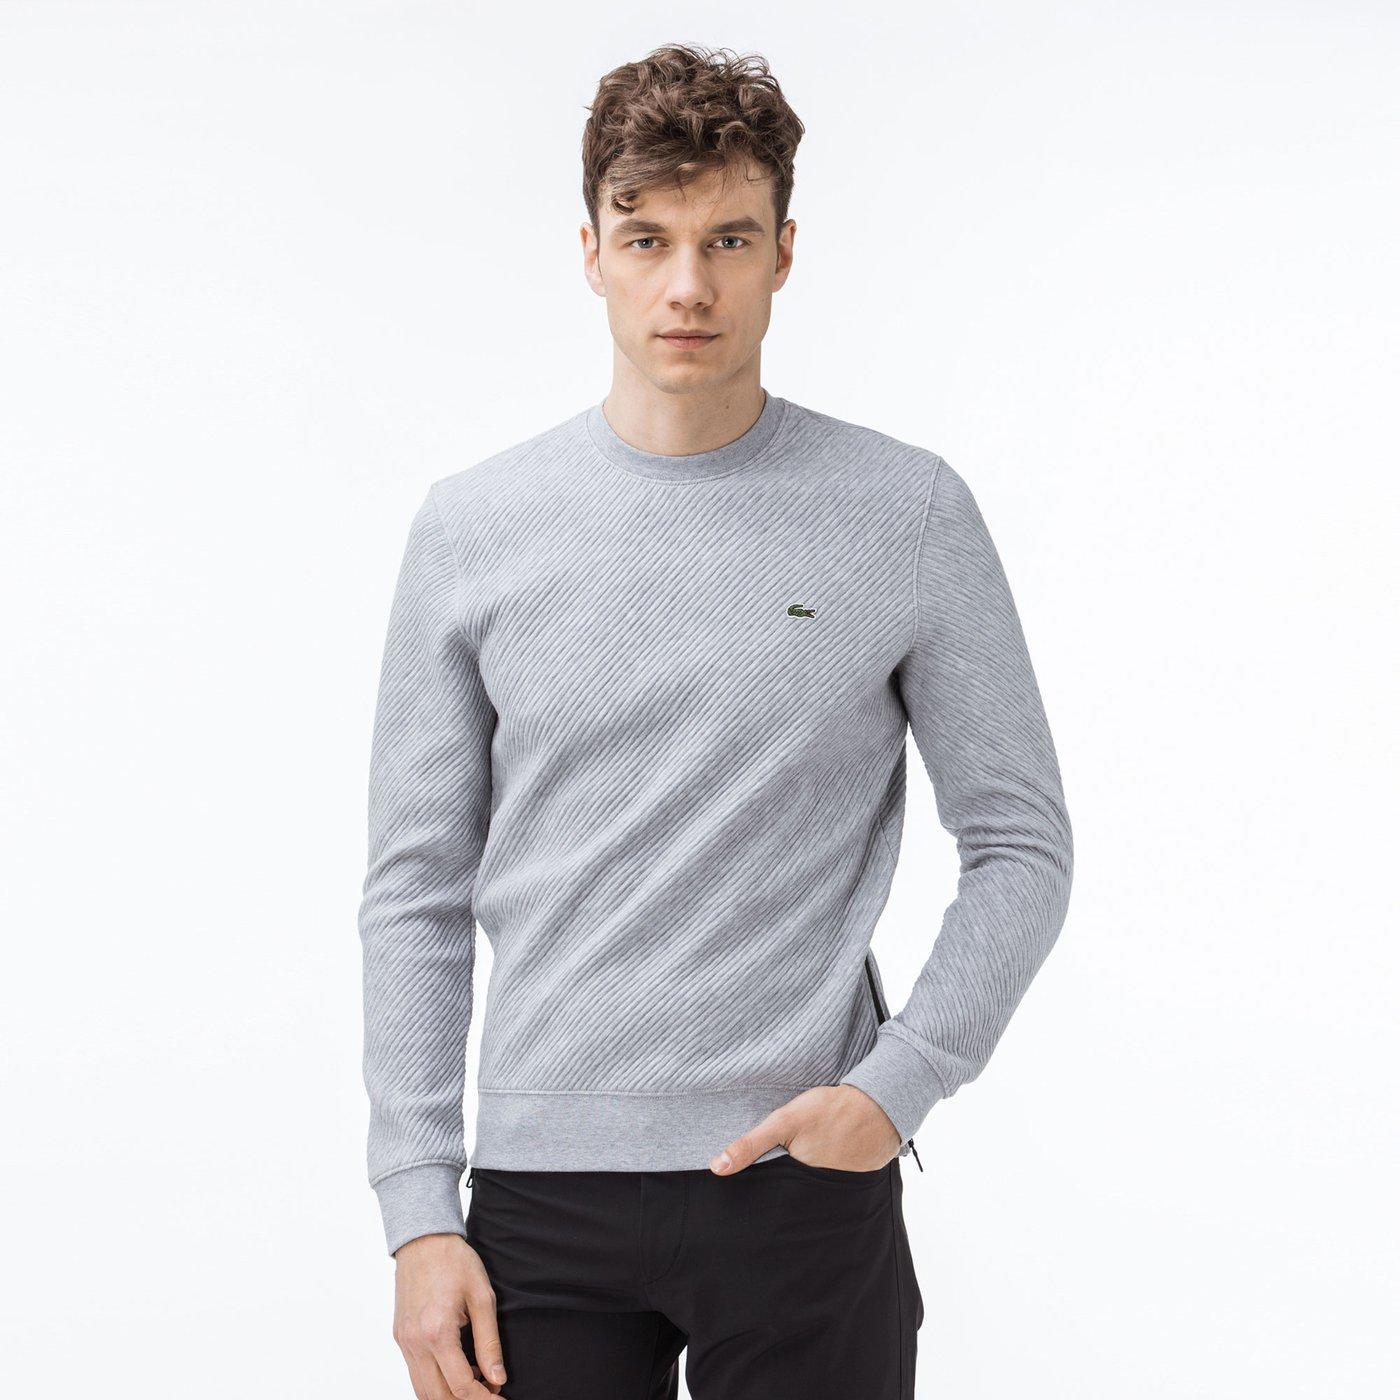 Lacoste Erkek Gri Sweatshirt